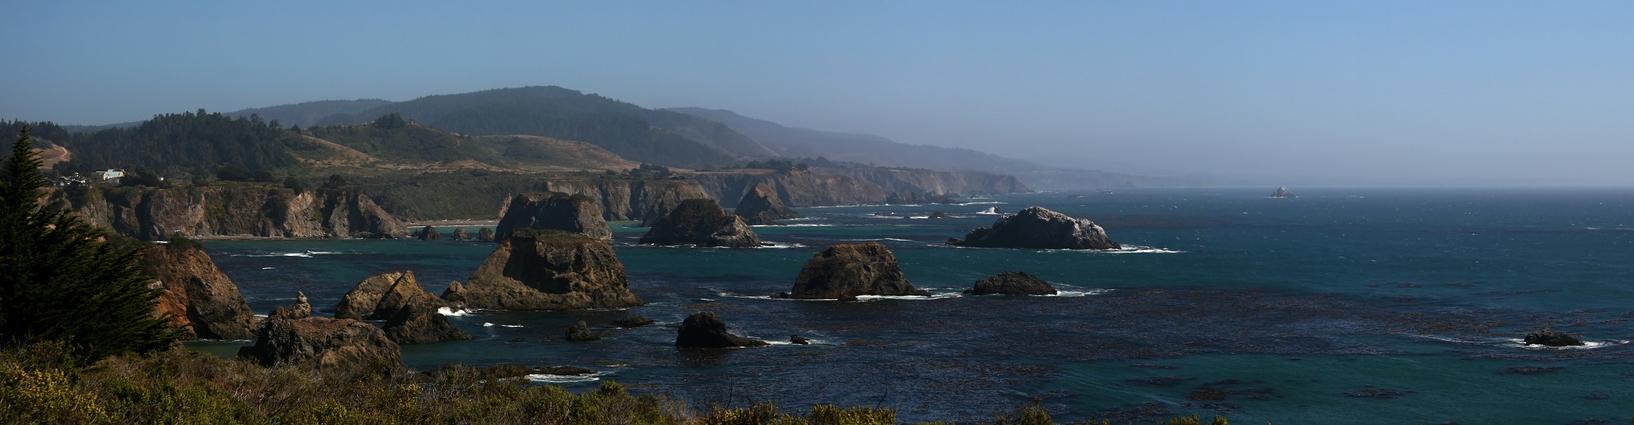 Coast - View